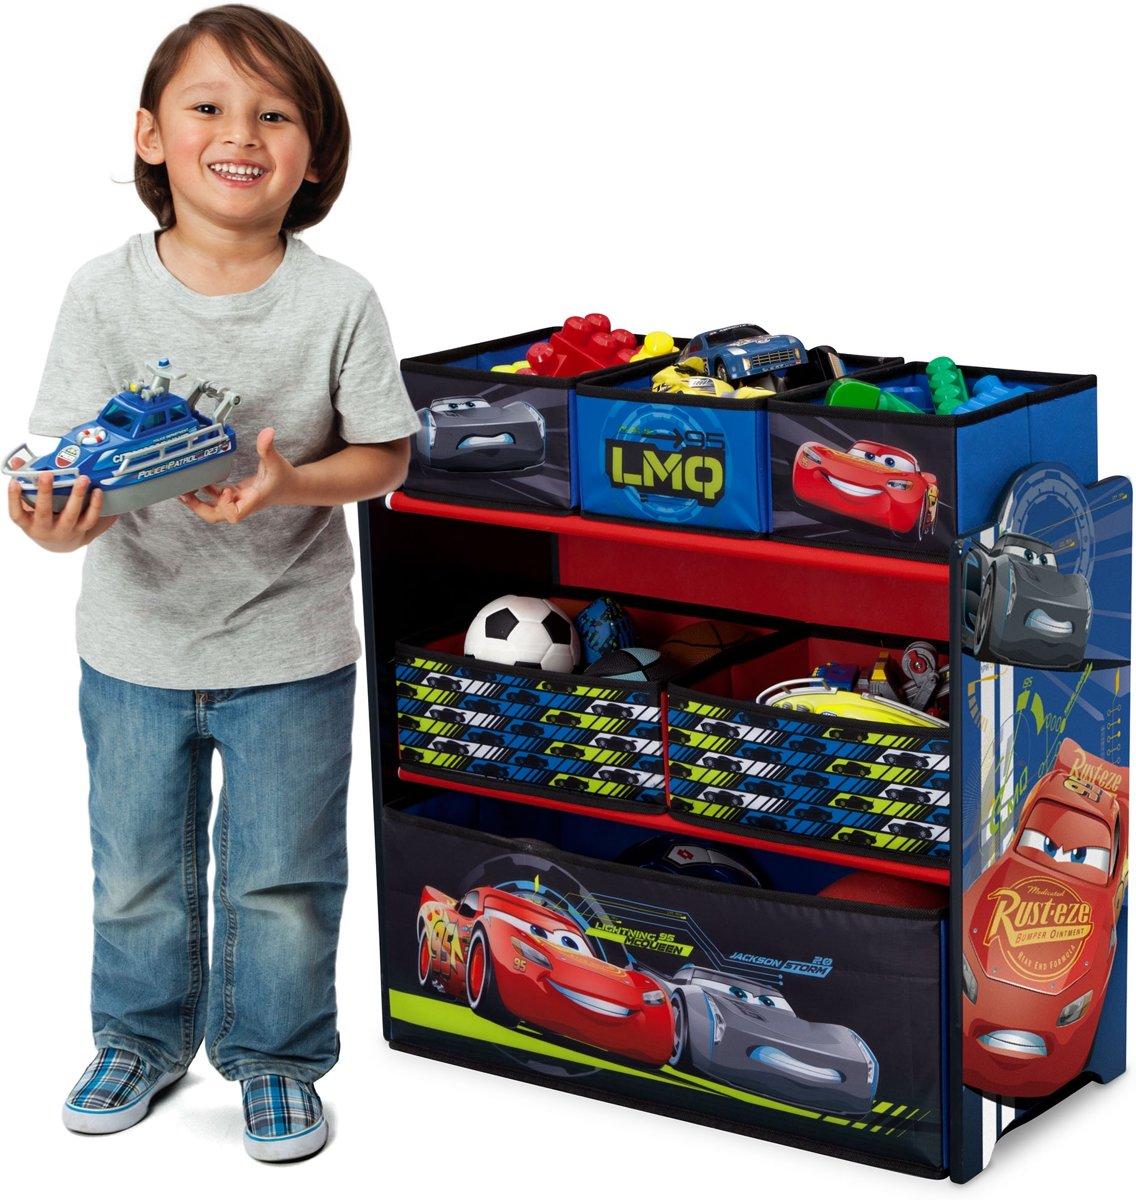 Multi Opbergkast Cars.Disney Cars Speelgoed Opbergkast Lmq Aa900aa7de Kwaradaily Com